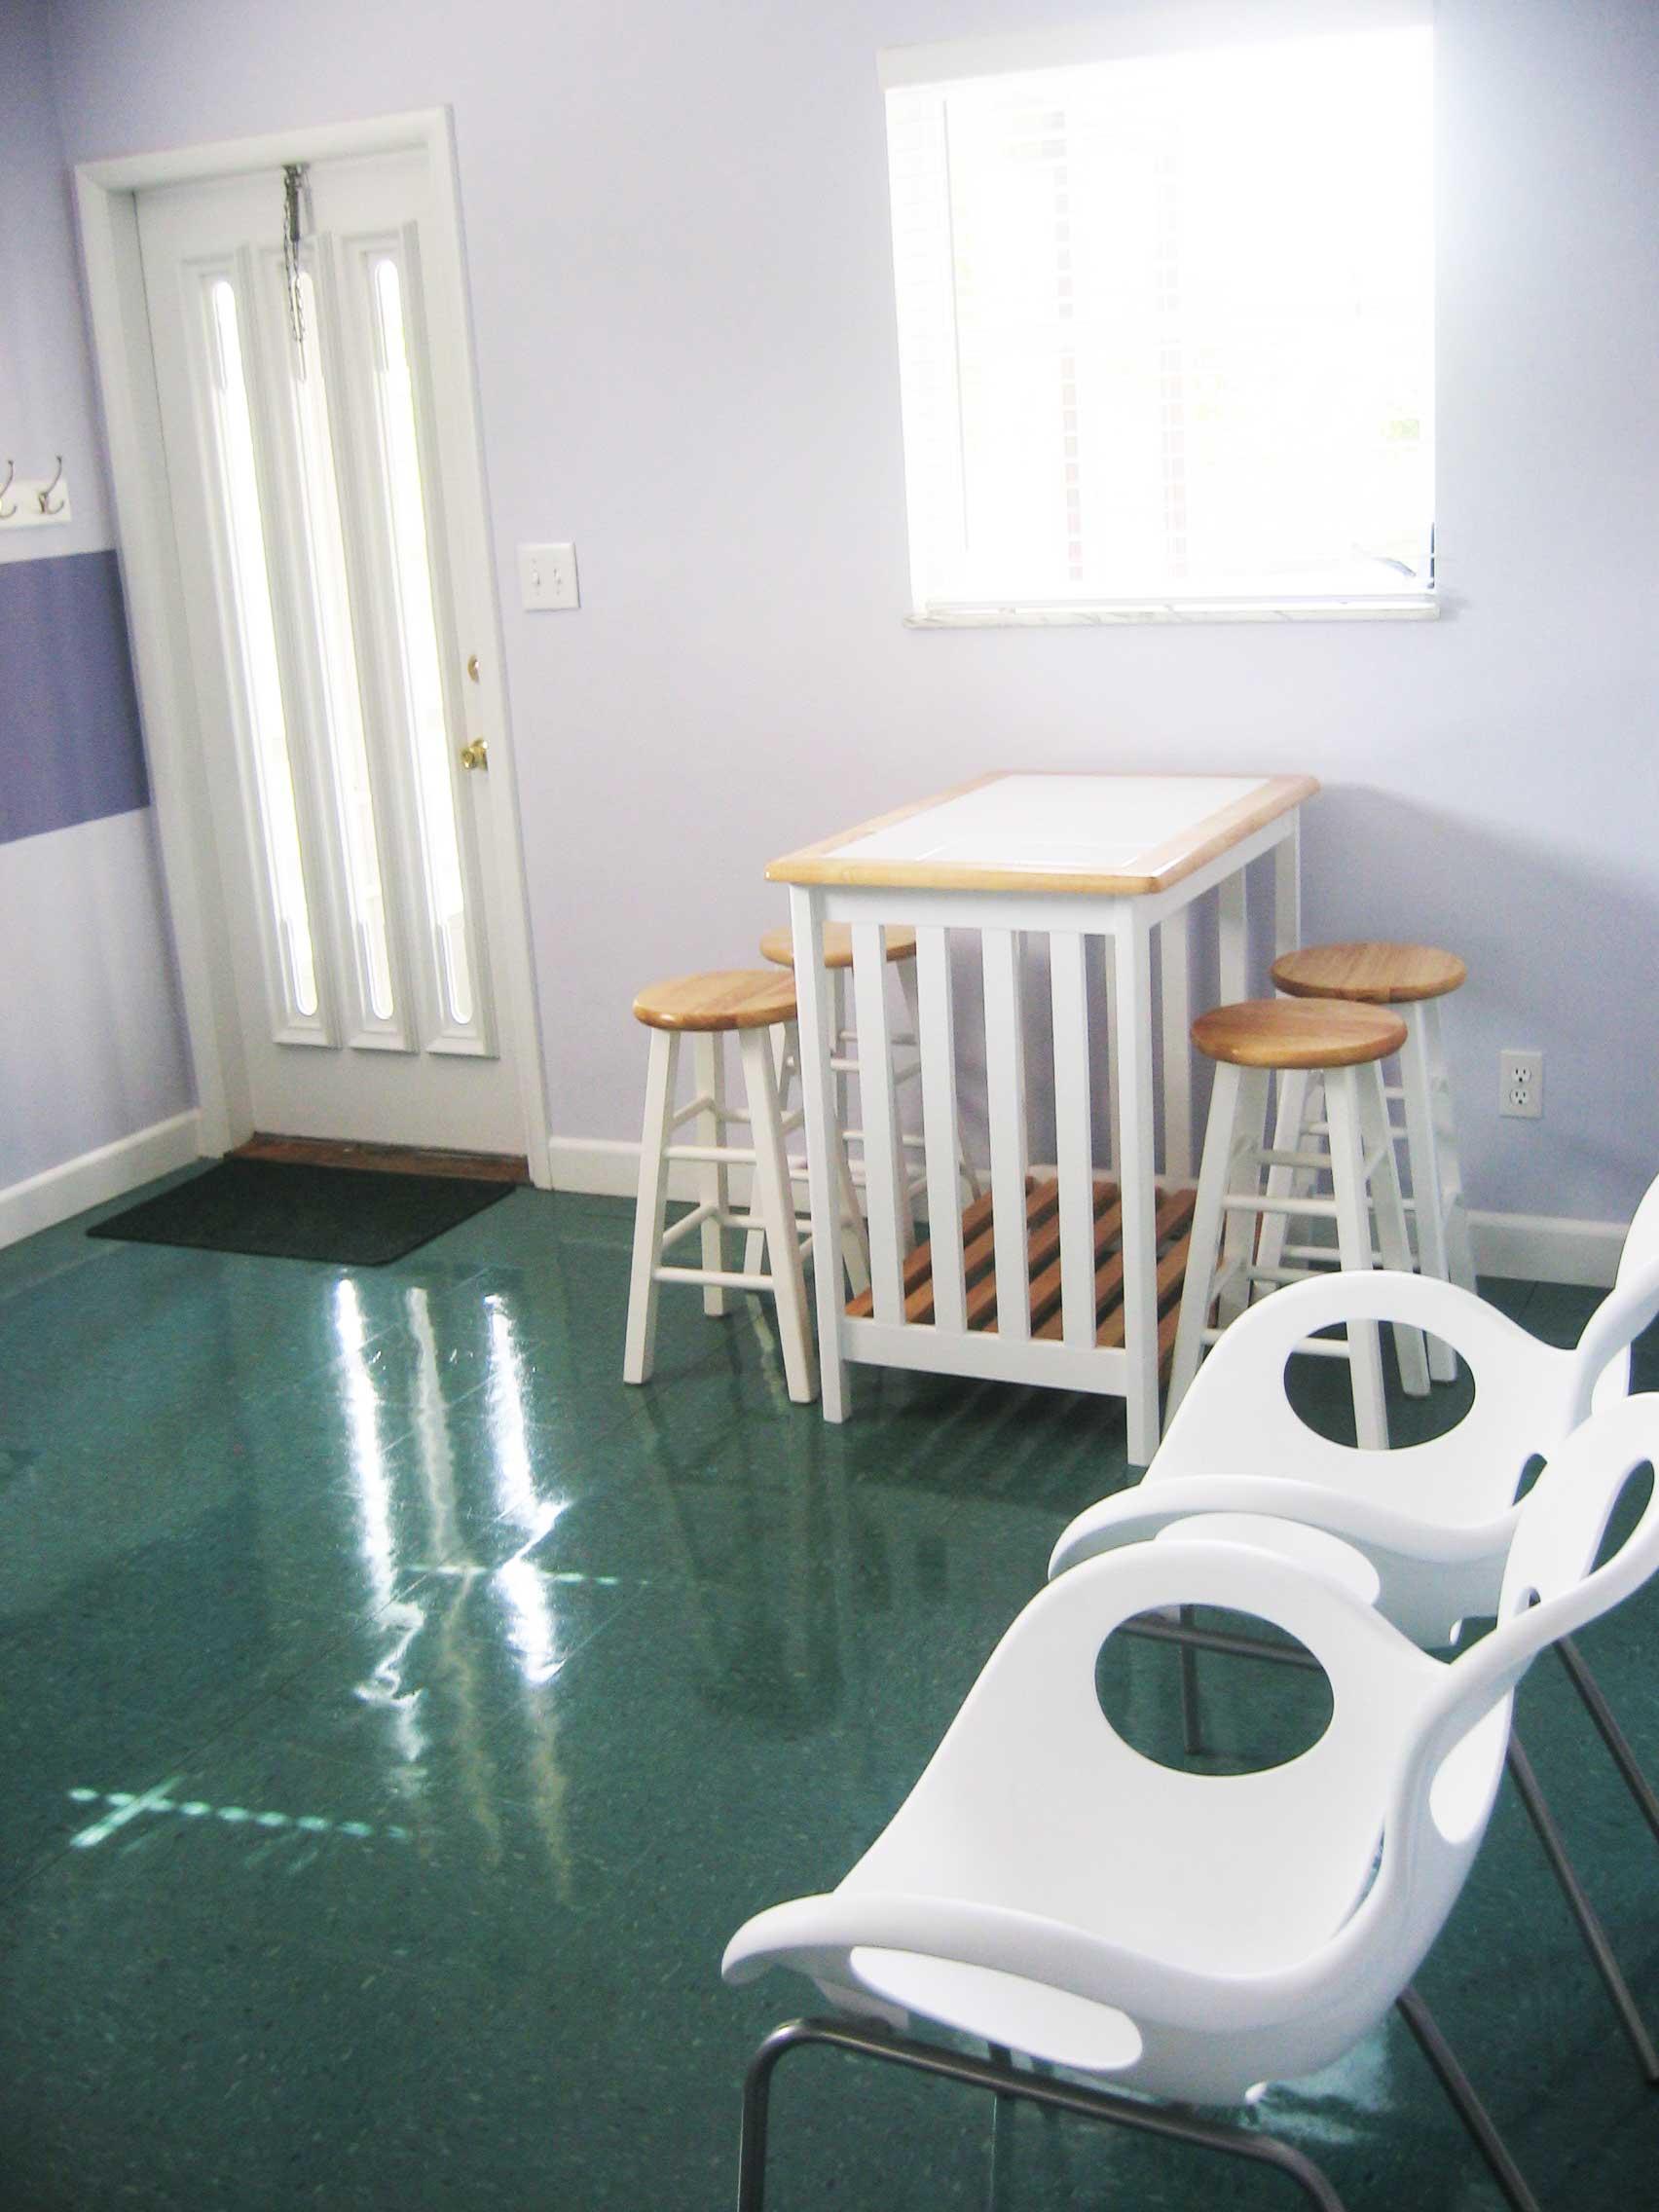 downstairs-waiting-room-two_MOD.jpg